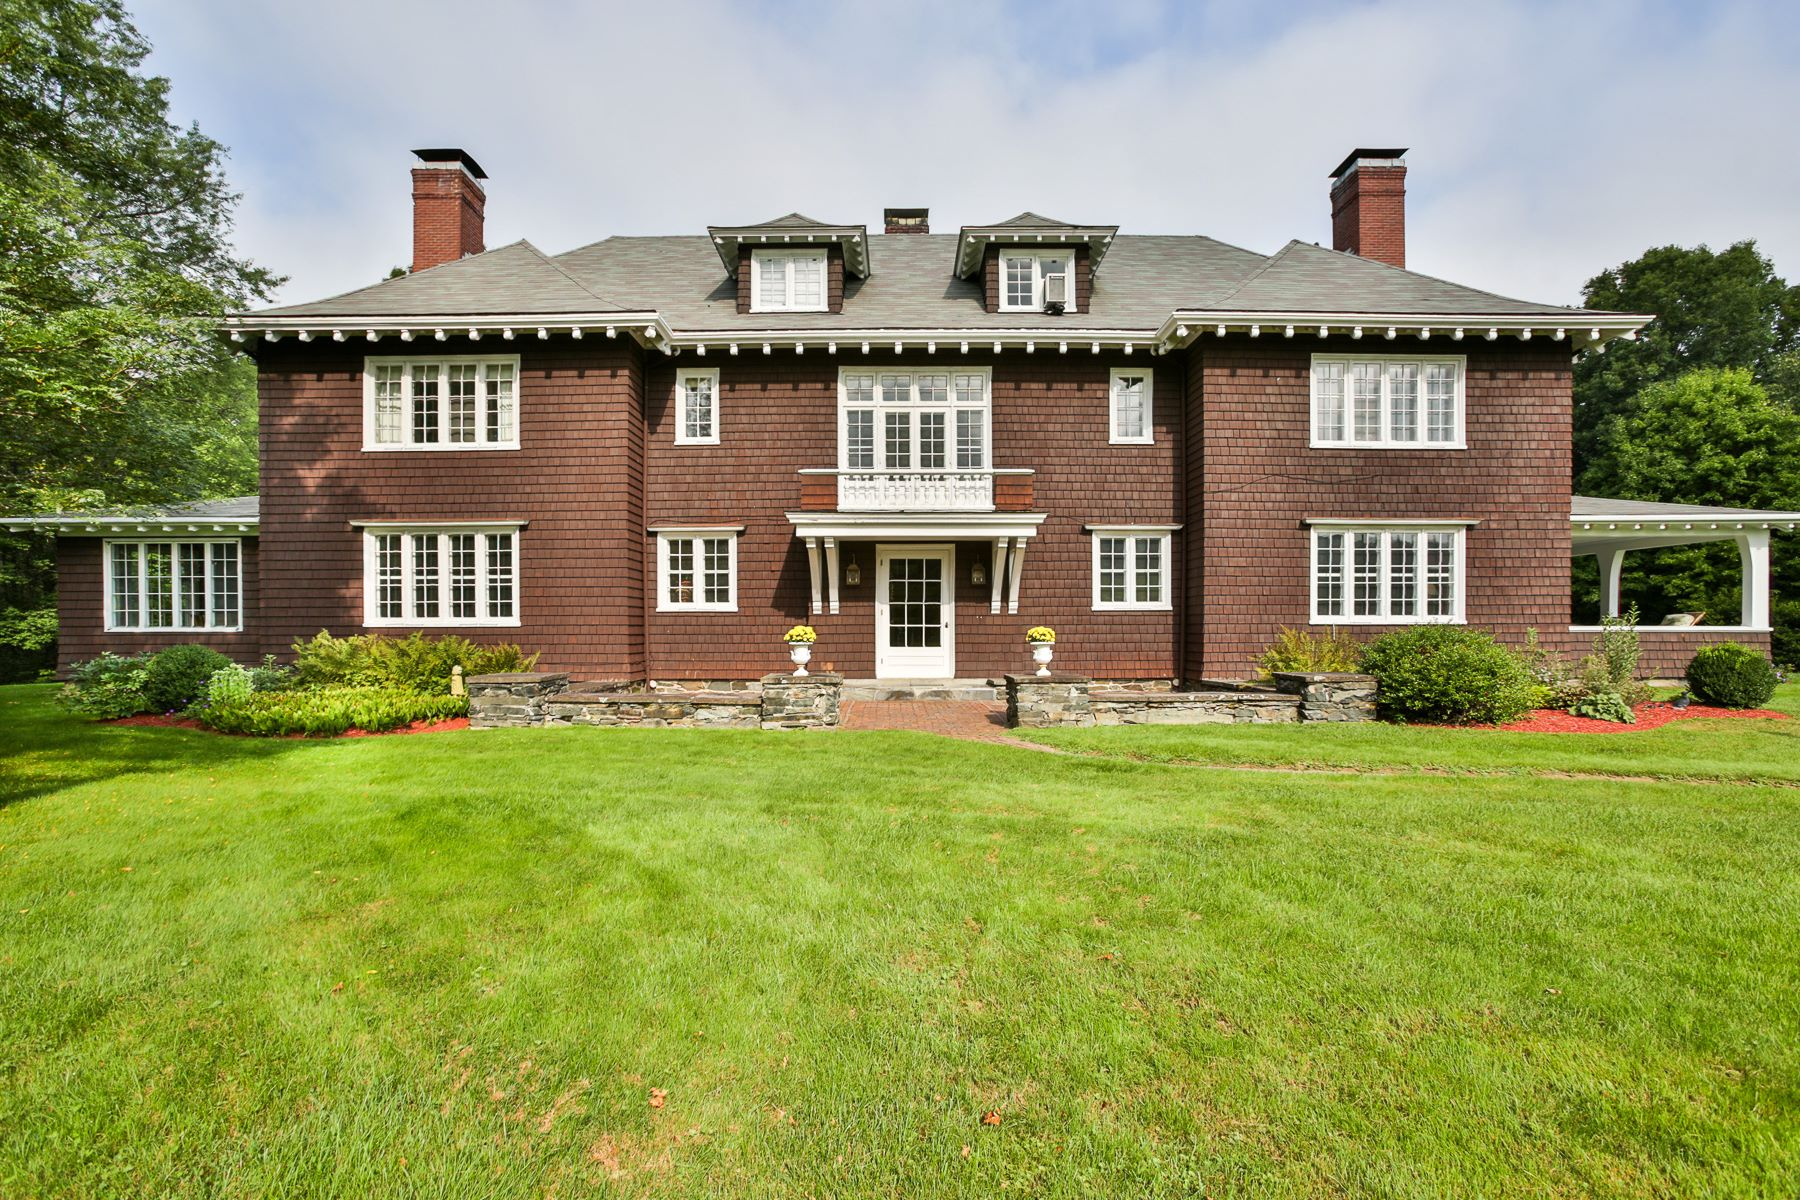 Single Family Home for Sale at Elegant Victorian home in Cornish Art Colony 231 Platt Rd Cornish, New Hampshire, 03745 United States